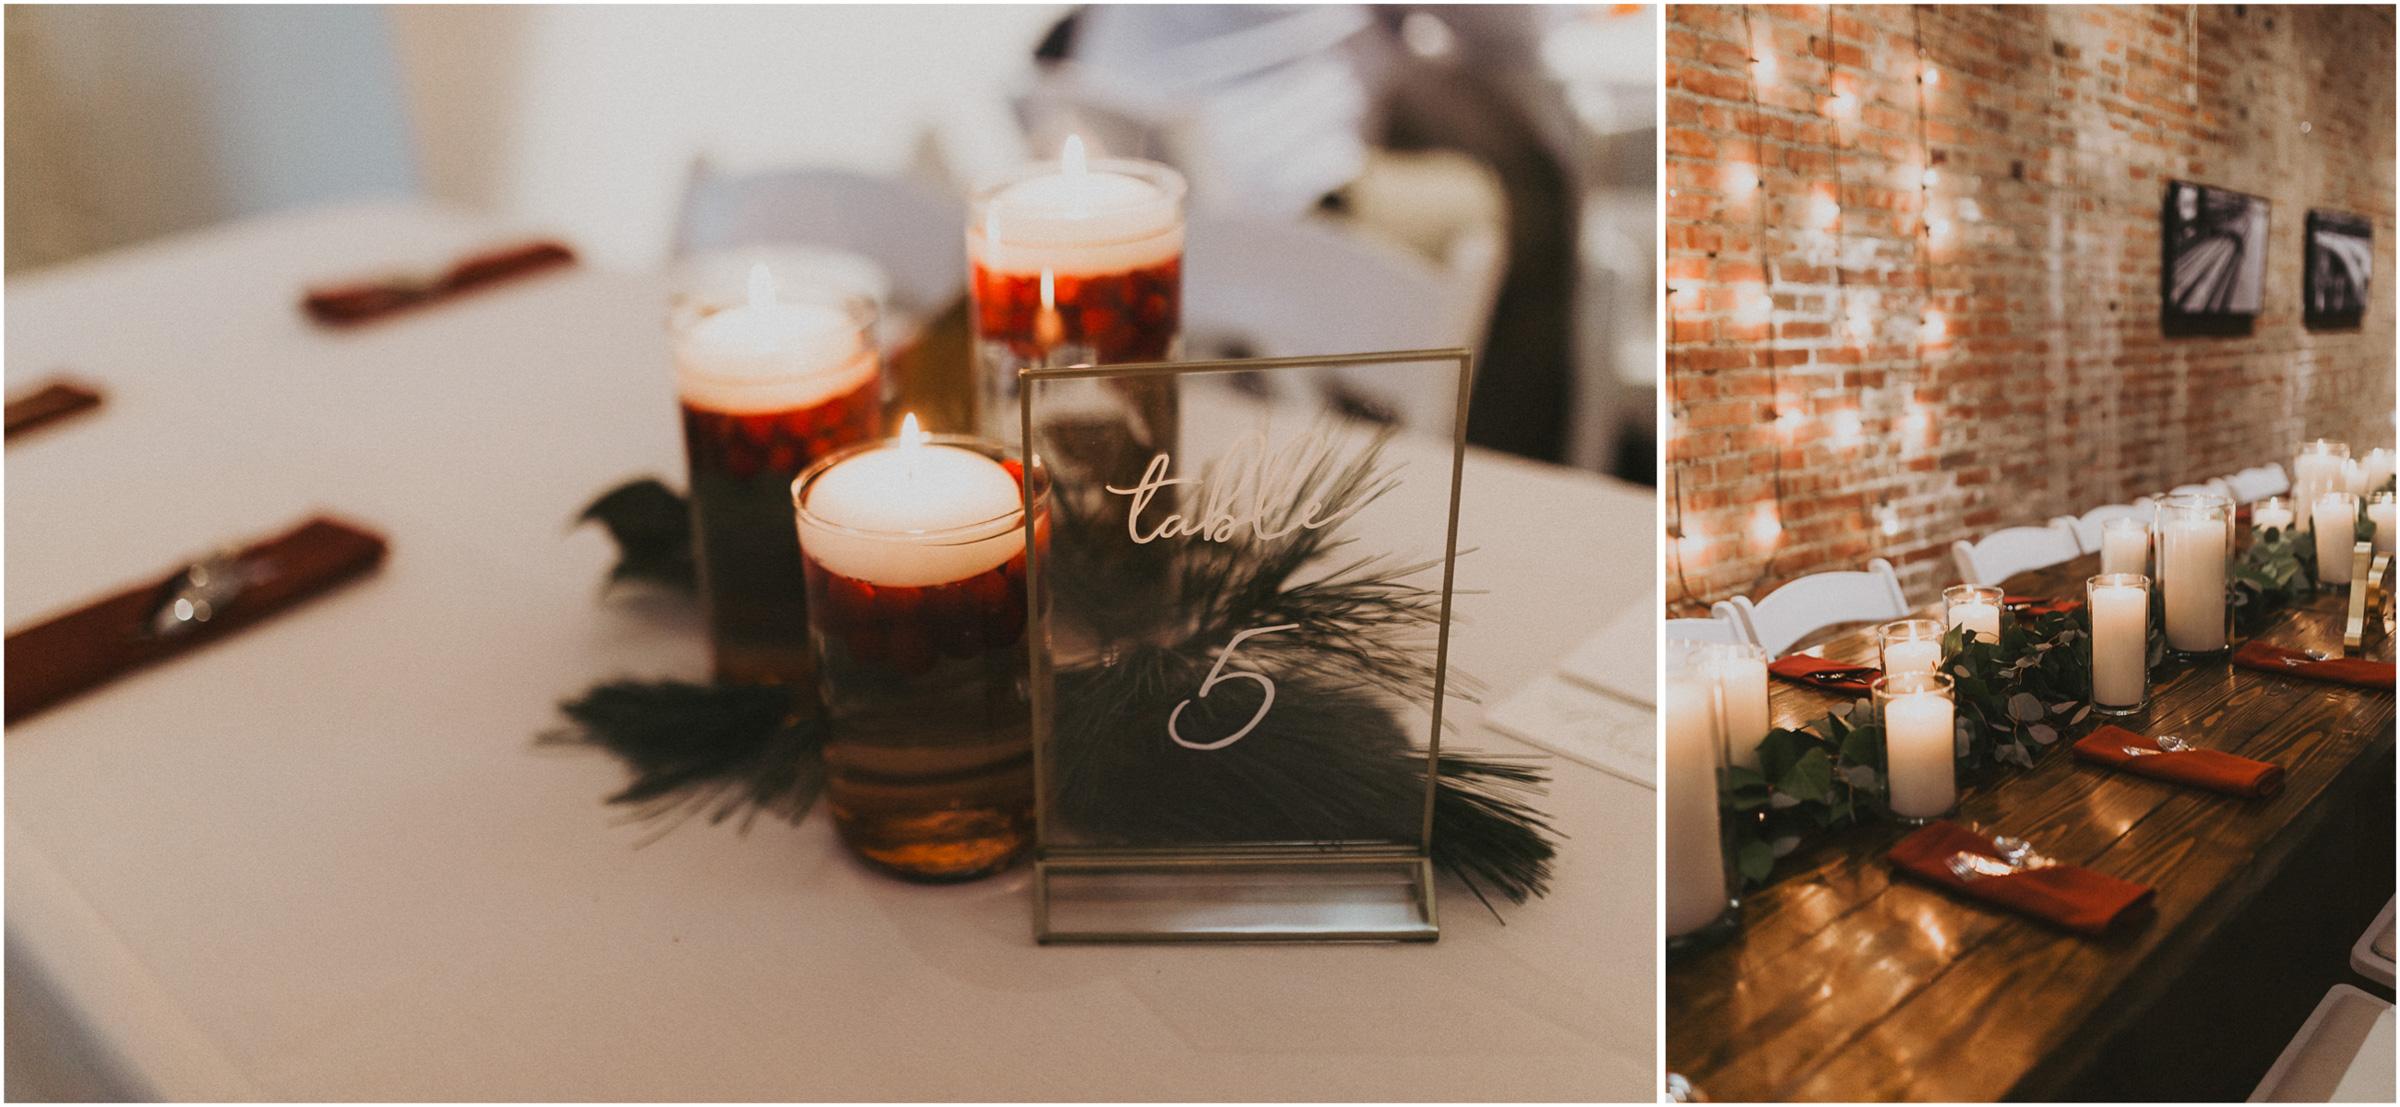 alyssa barletter photography 2016 main kansas city wedding rainy day photographer grace and justin magott-66.jpg